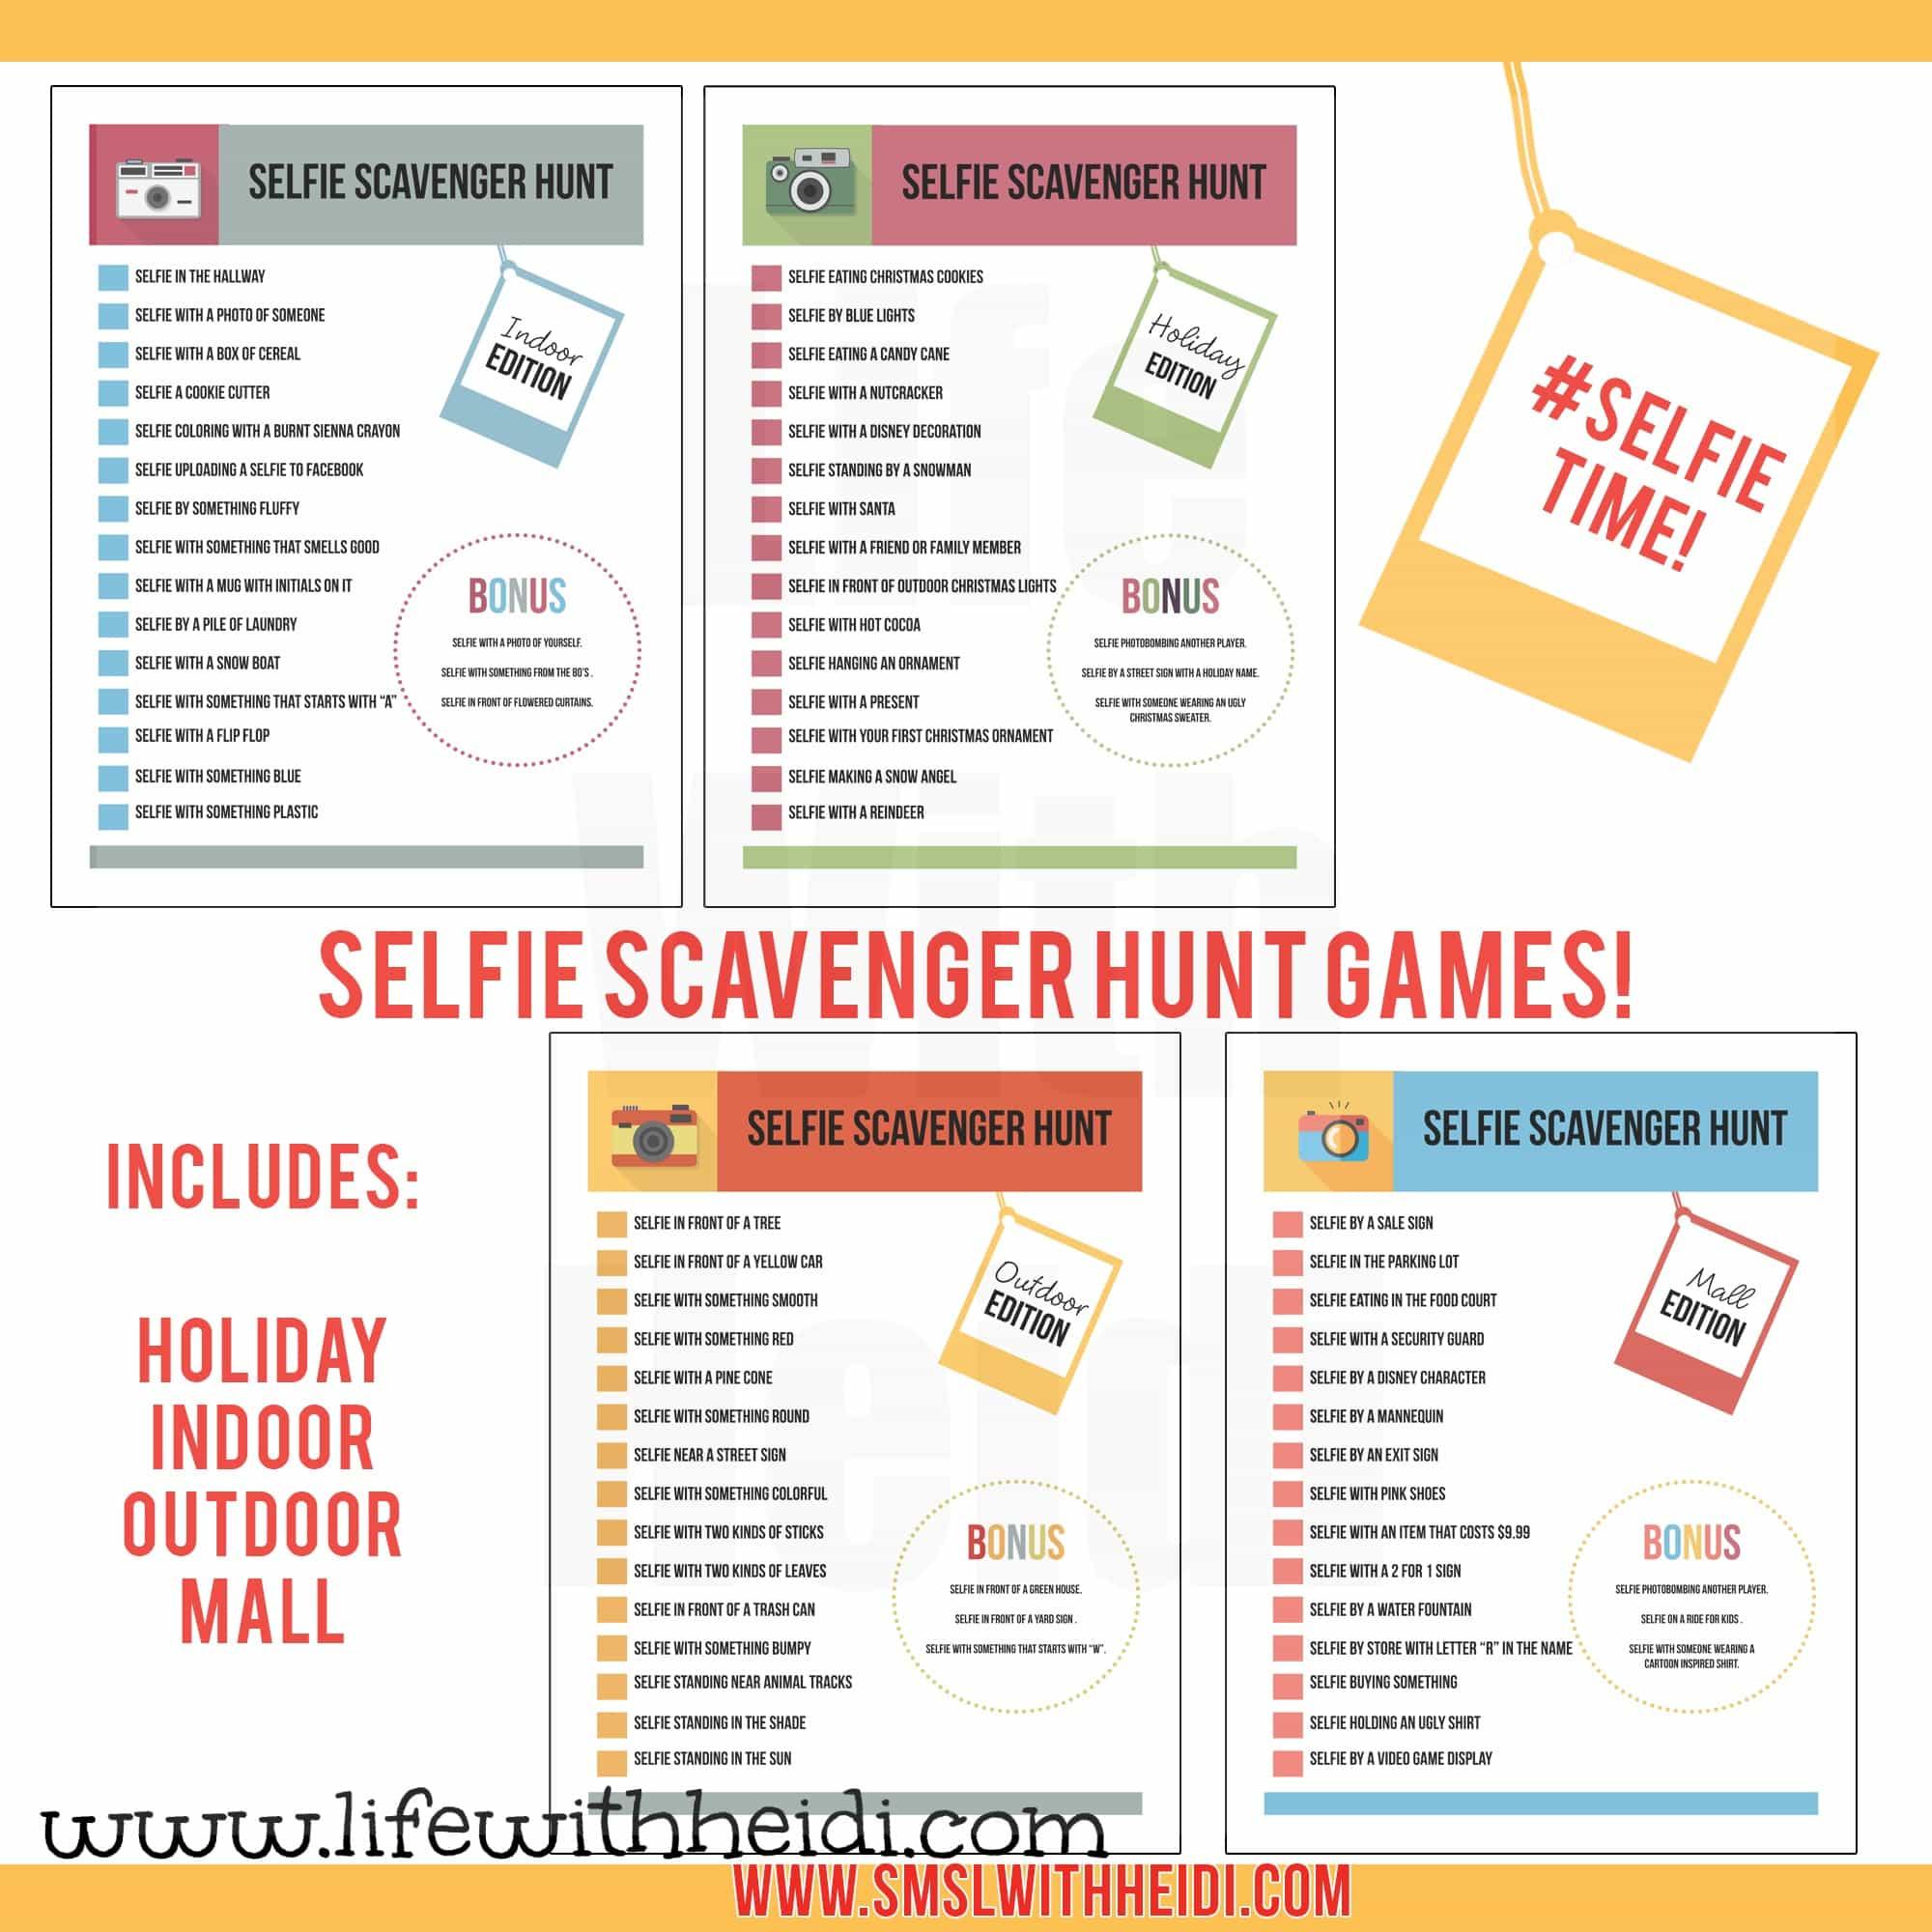 Selfie-Scavenger-Hunt-Ideas | Life with Heidi